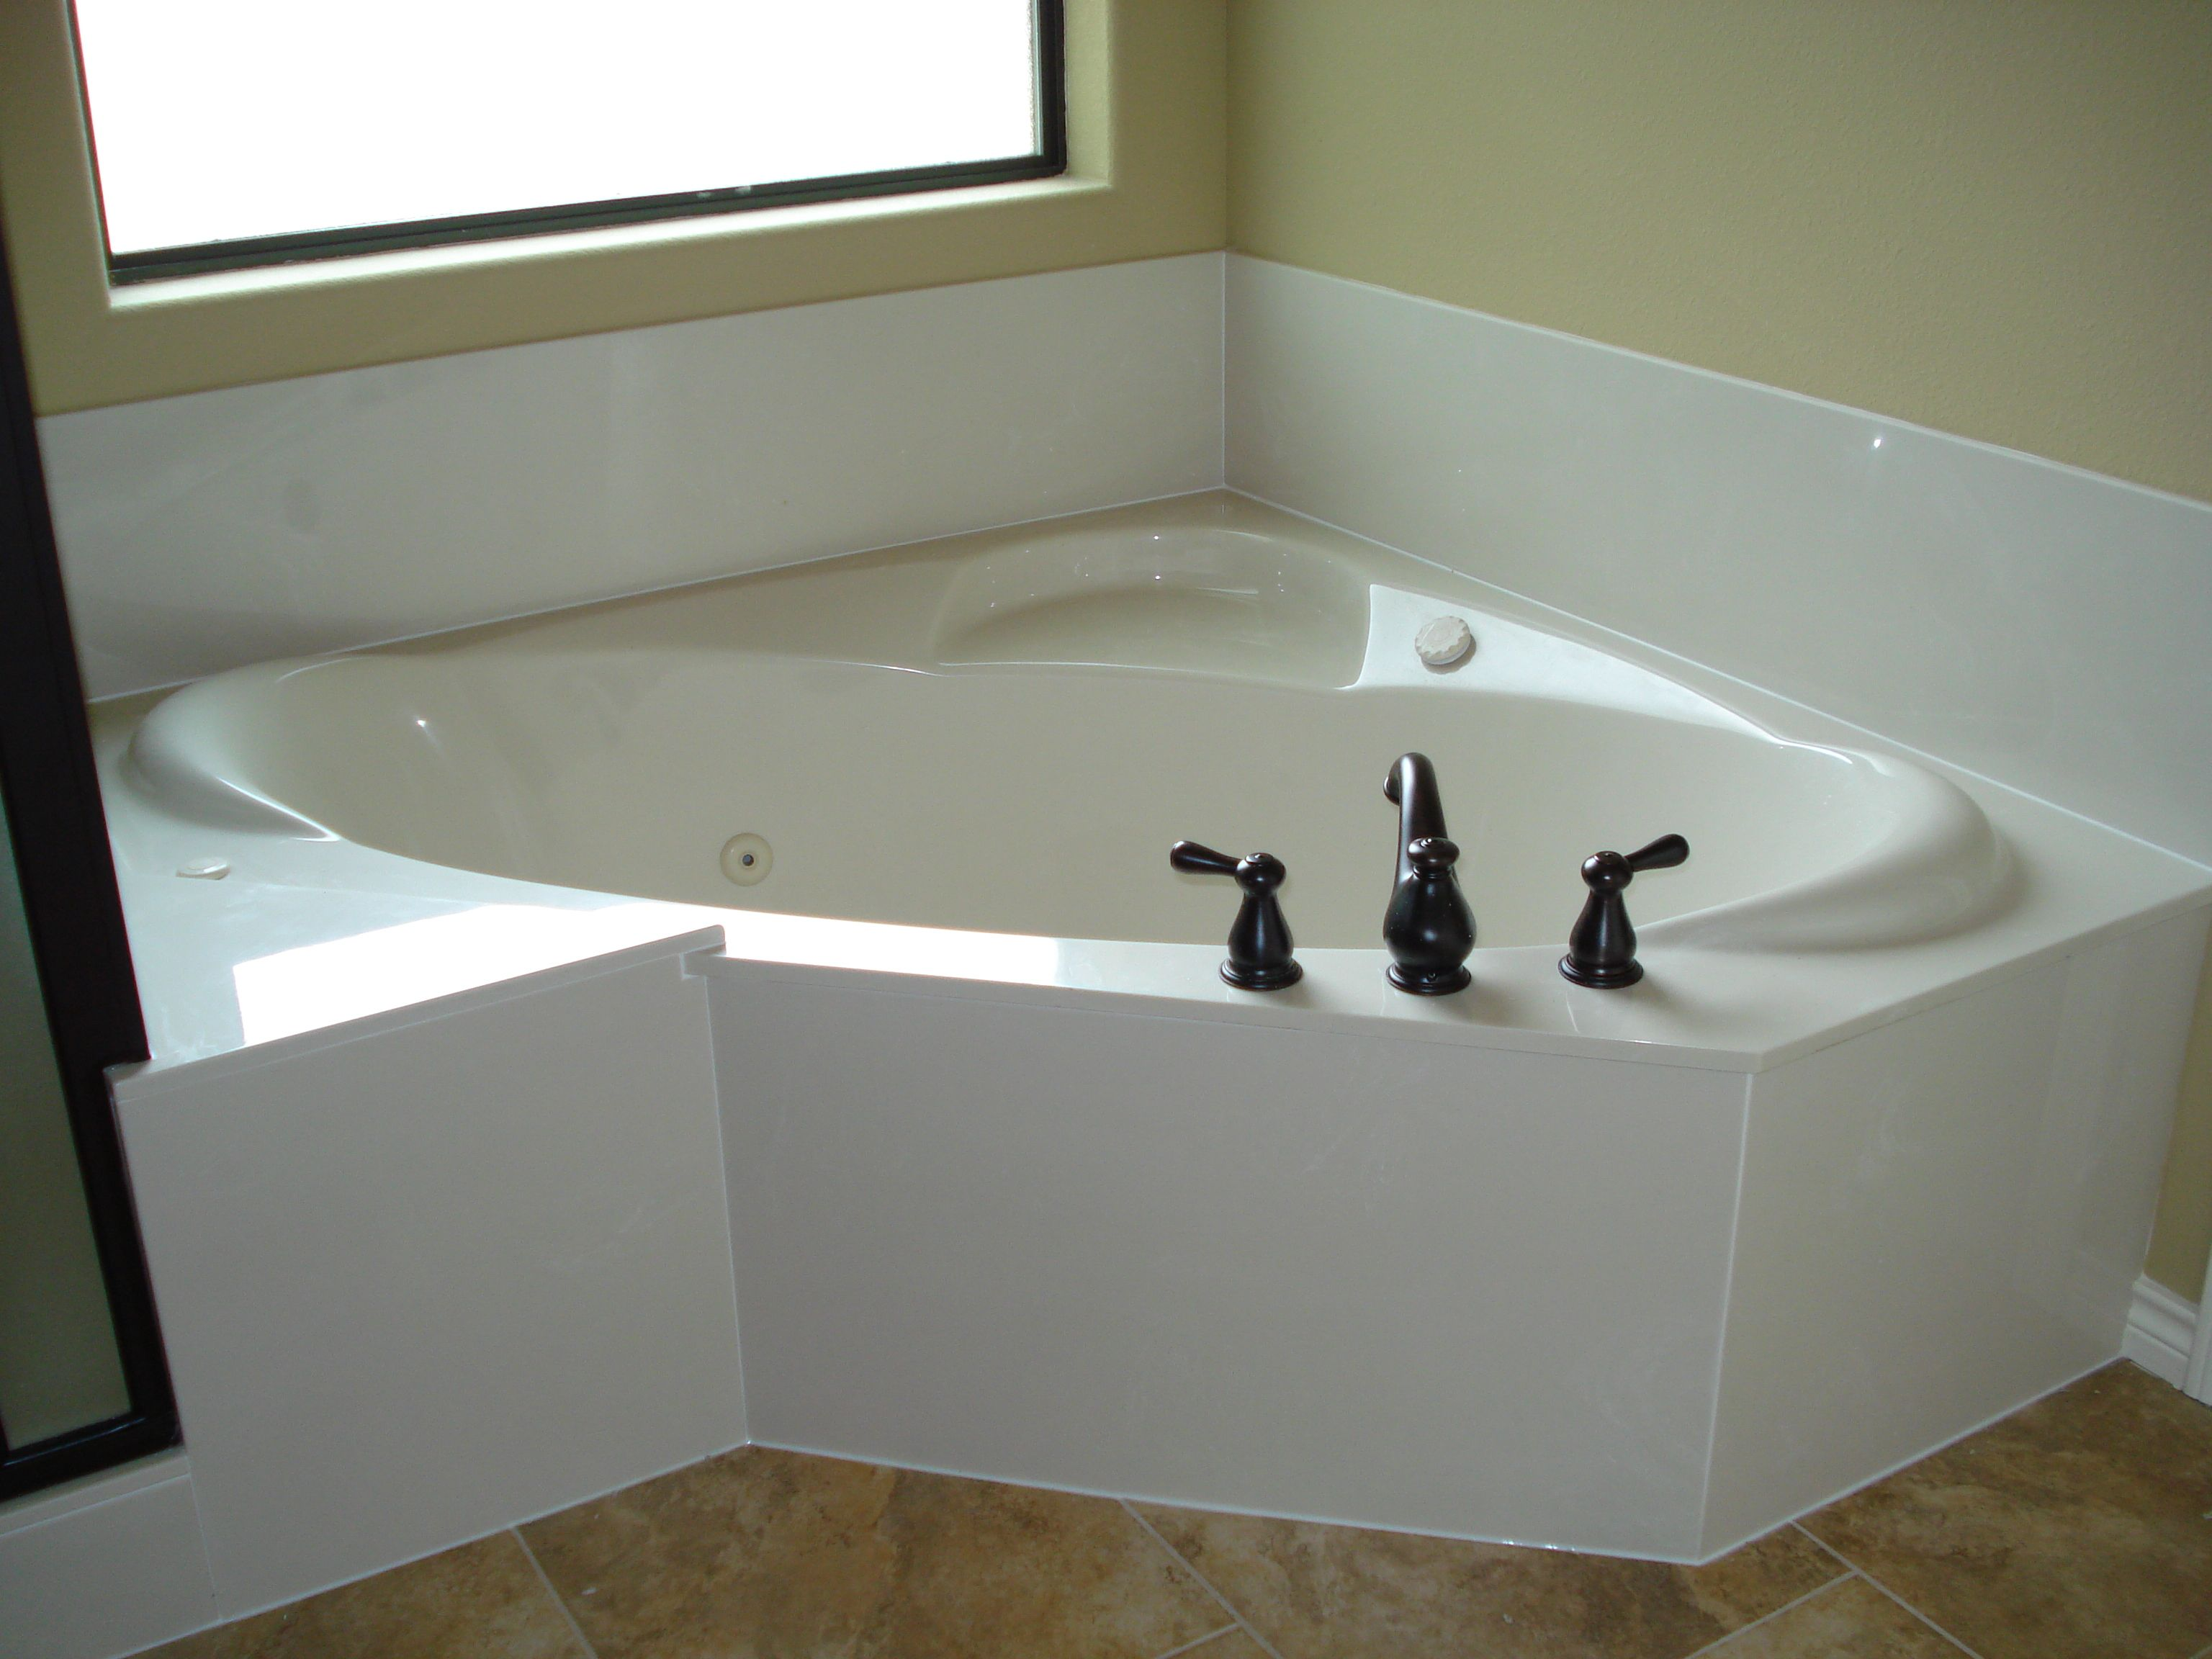 Http Www Google Com Blank Html Bathtub Shower Combo Bathtub Tile Tub Surround